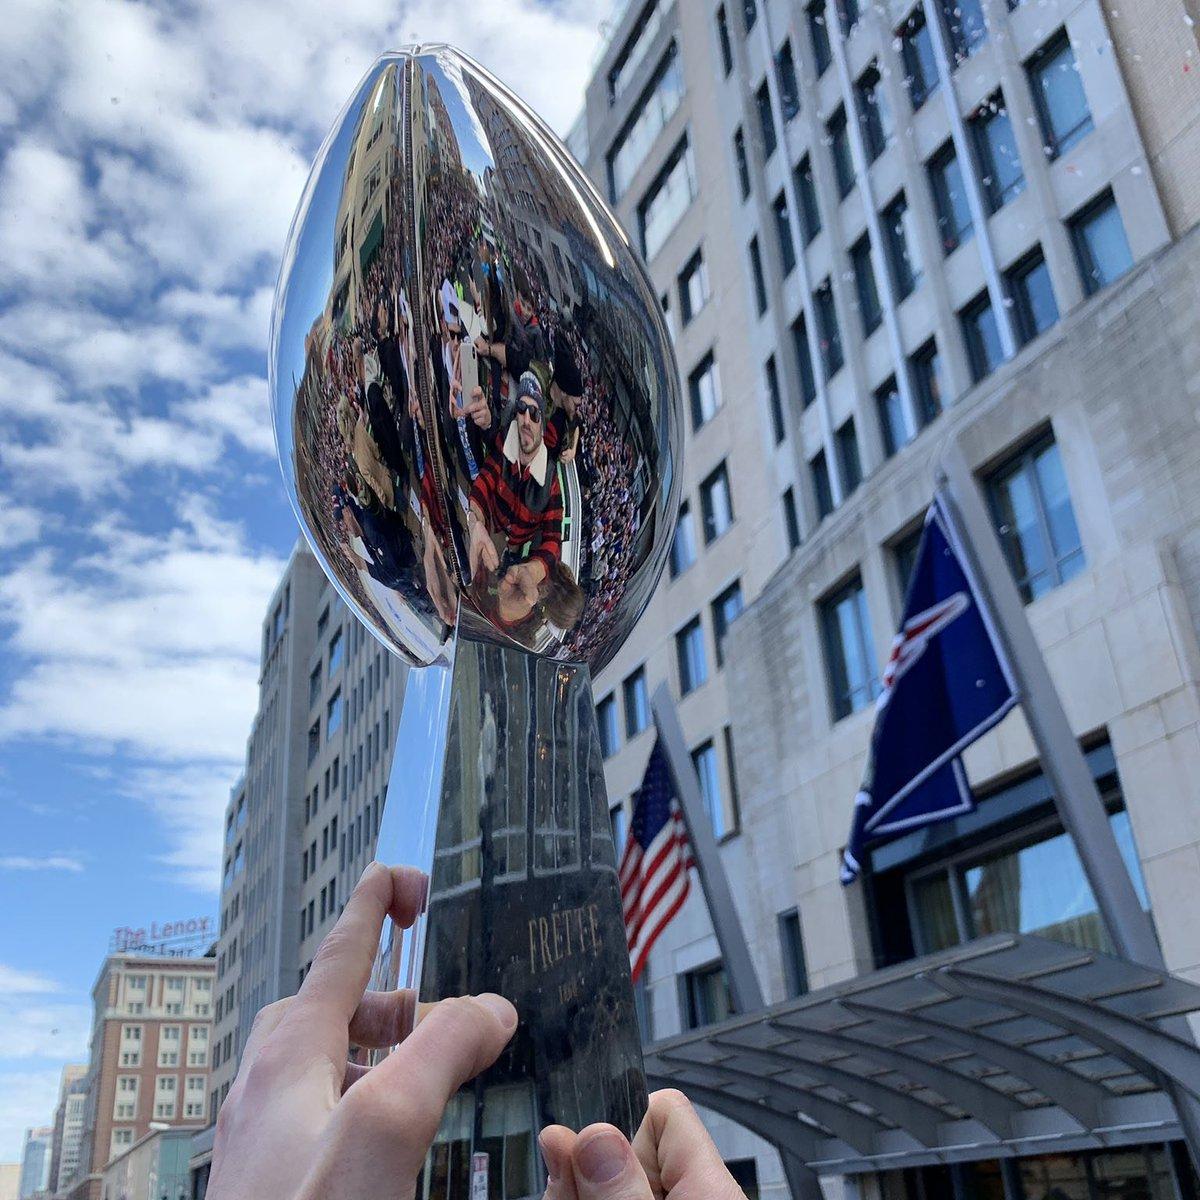 New England Patriots Campeones del Super Bowl LIII.Recibimiento en Boston,Massachusetts.#NewEnglandPatriots #SBLIII #boston #Massachusetts #NFL #fansnfl #fanscolombia .pic.twitter.com/EjtOM9KIhF